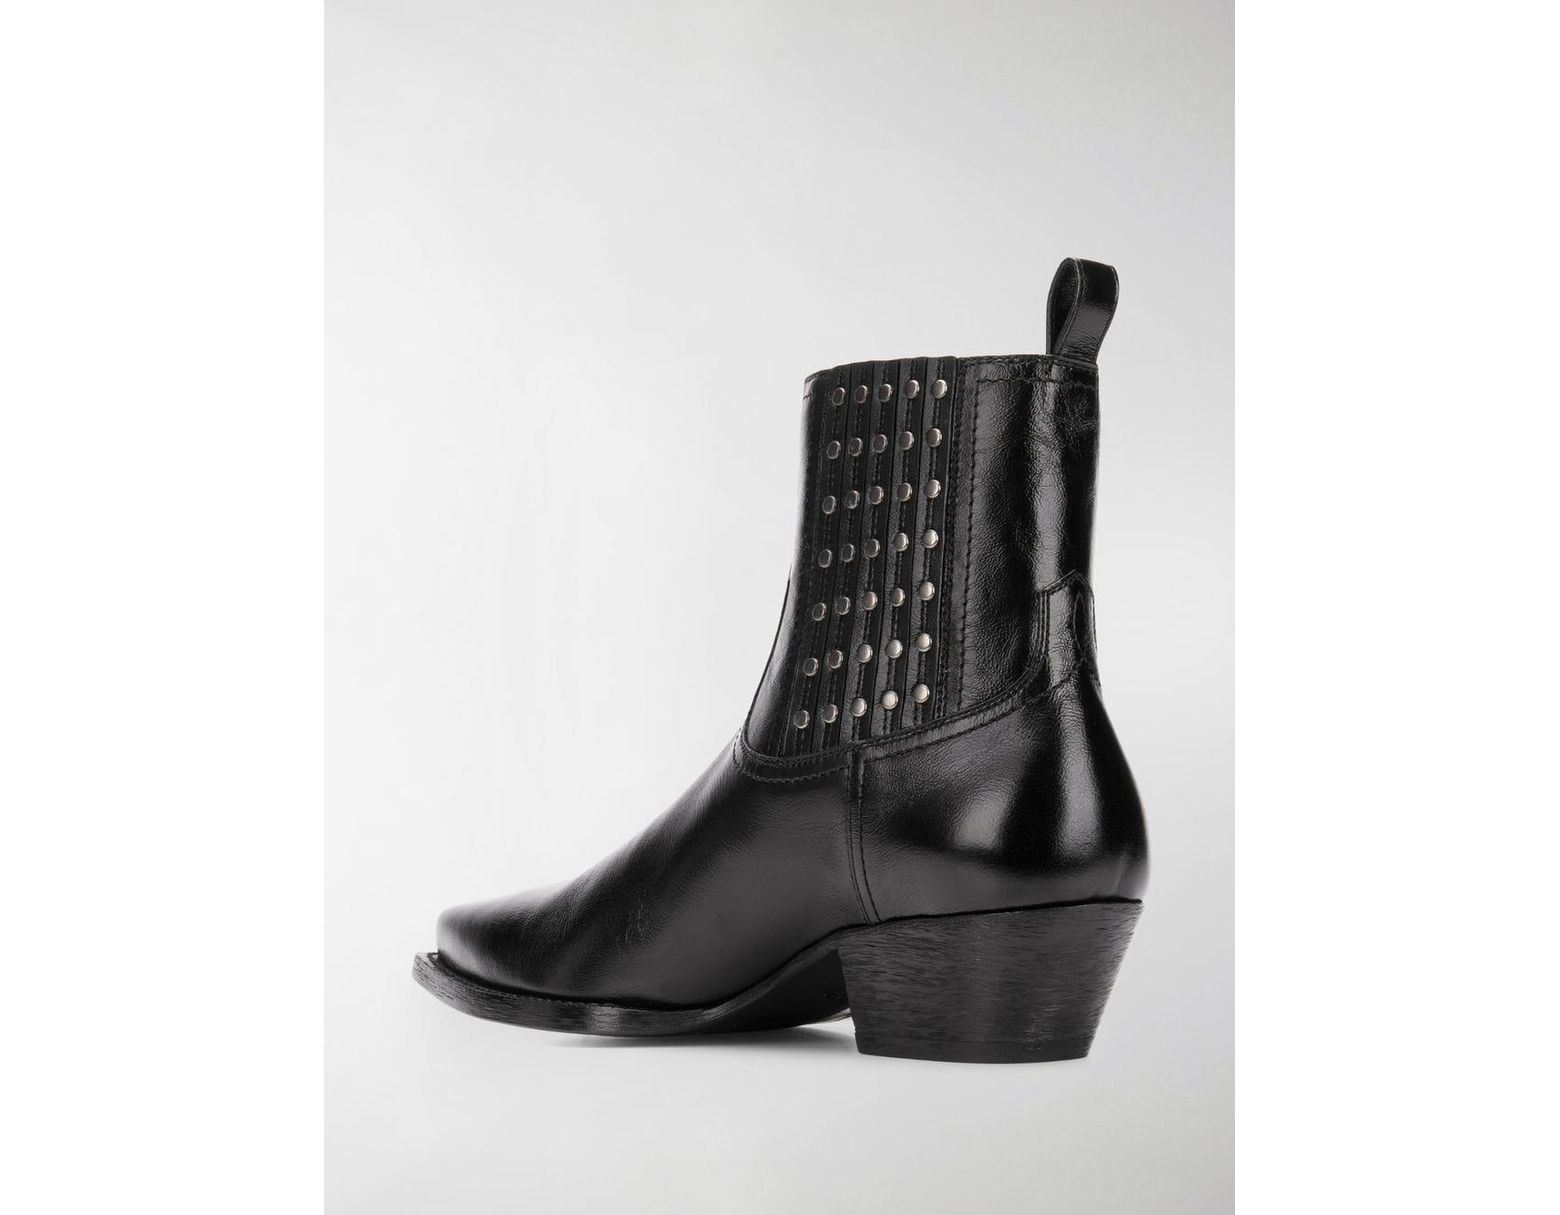 97ef757ecd6 Saint Laurent Lukas Camperos Studded Boots in Black - Save 12% - Lyst